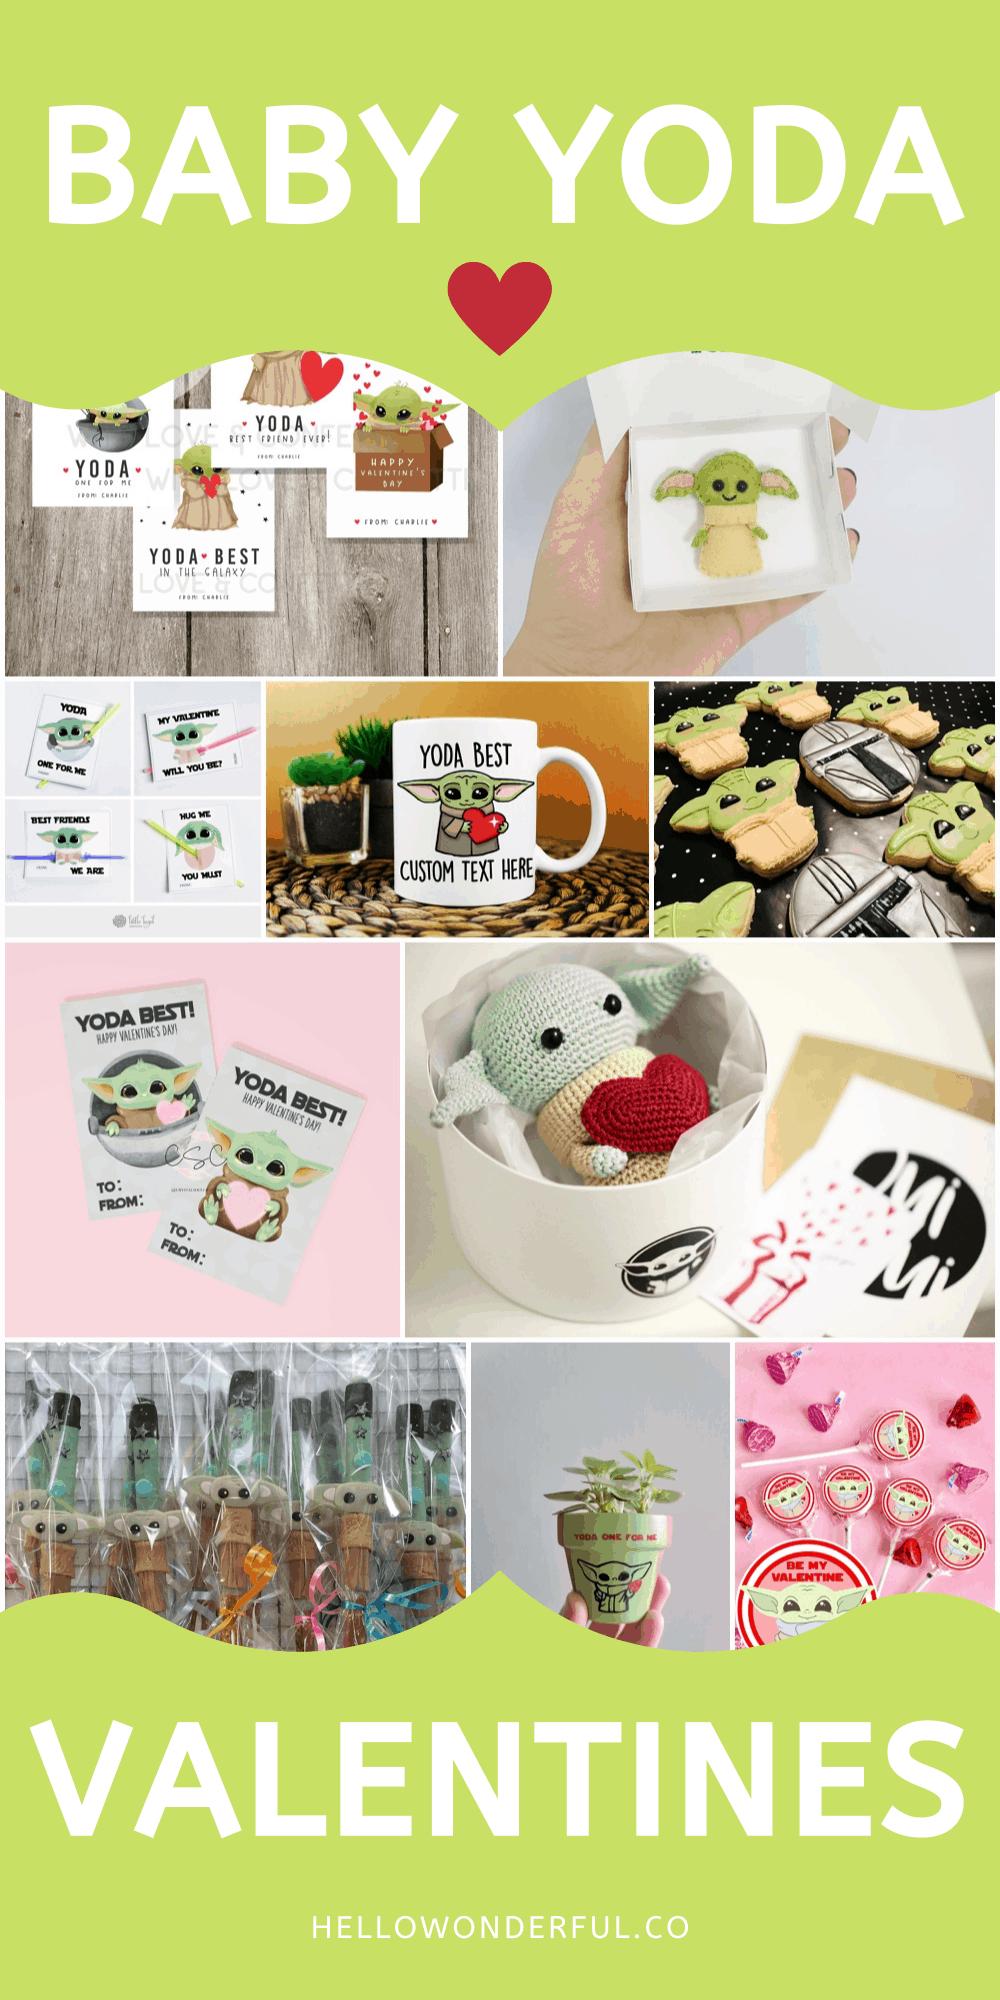 Baby Yoda Valentine Gifts for Kids